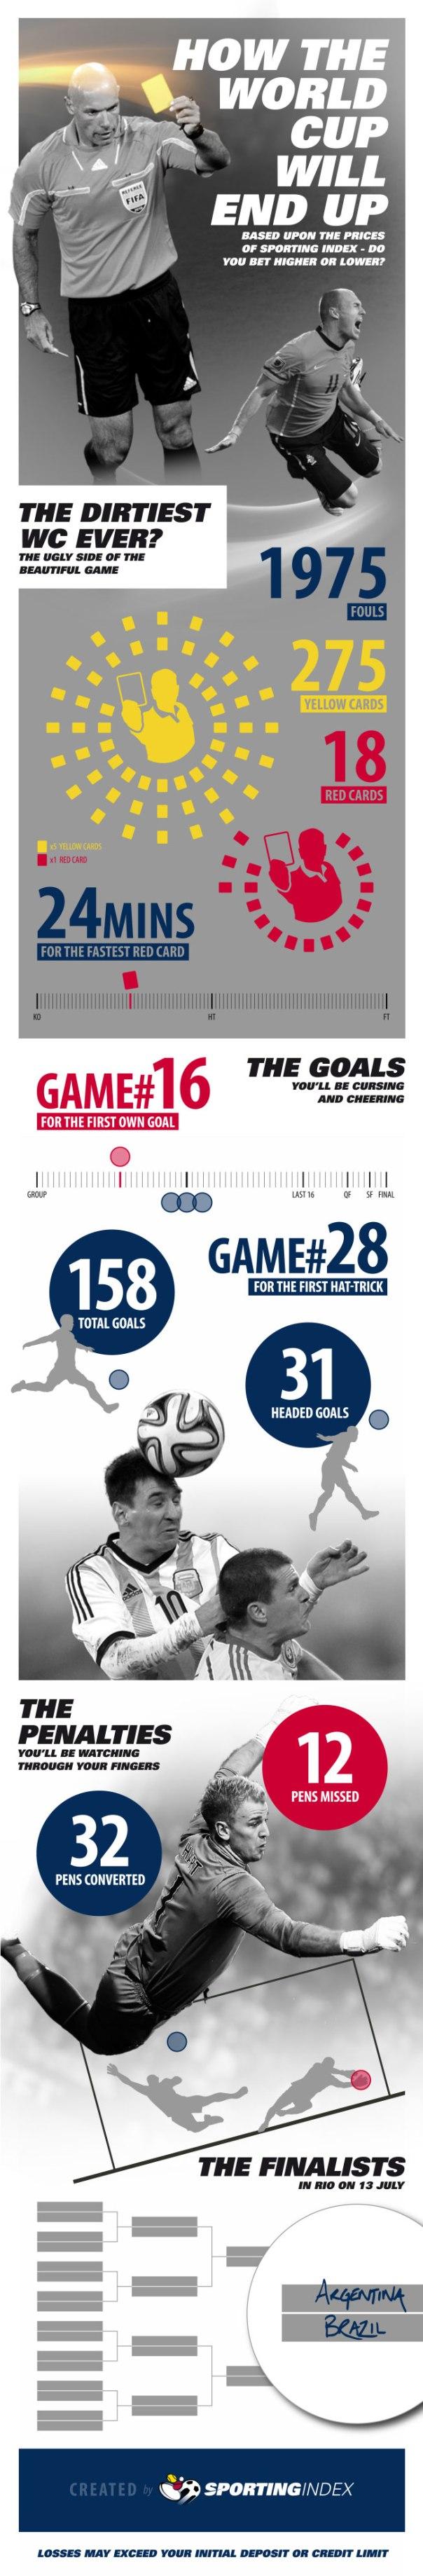 sportingindex_infographic_worldcuppredictor_2014